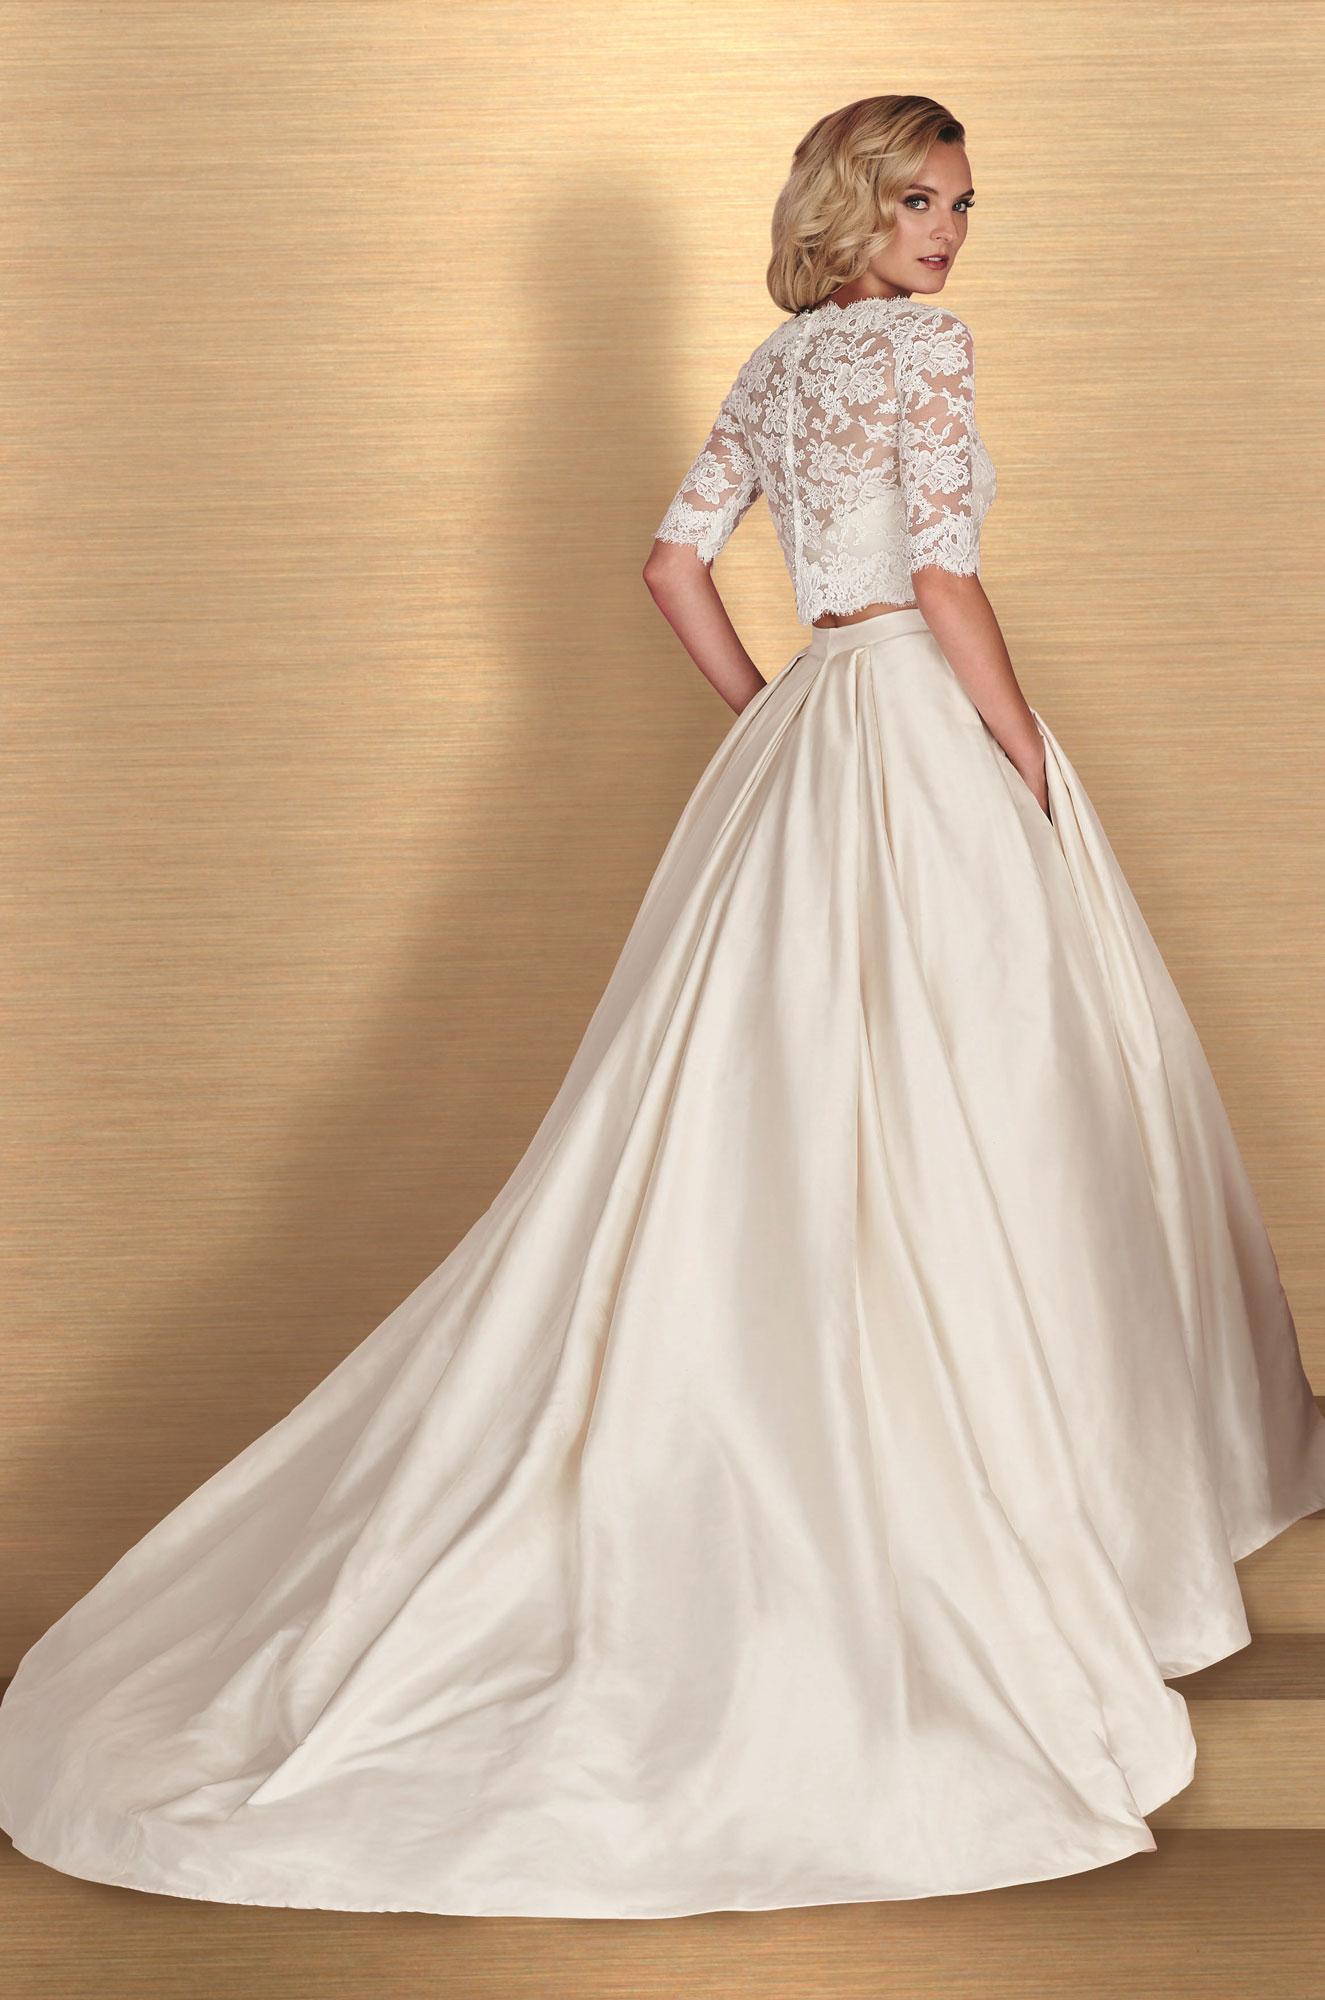 Paloma-Blanca-4667-3-Piece-Gown-Salon-Sample_6189B.jpg